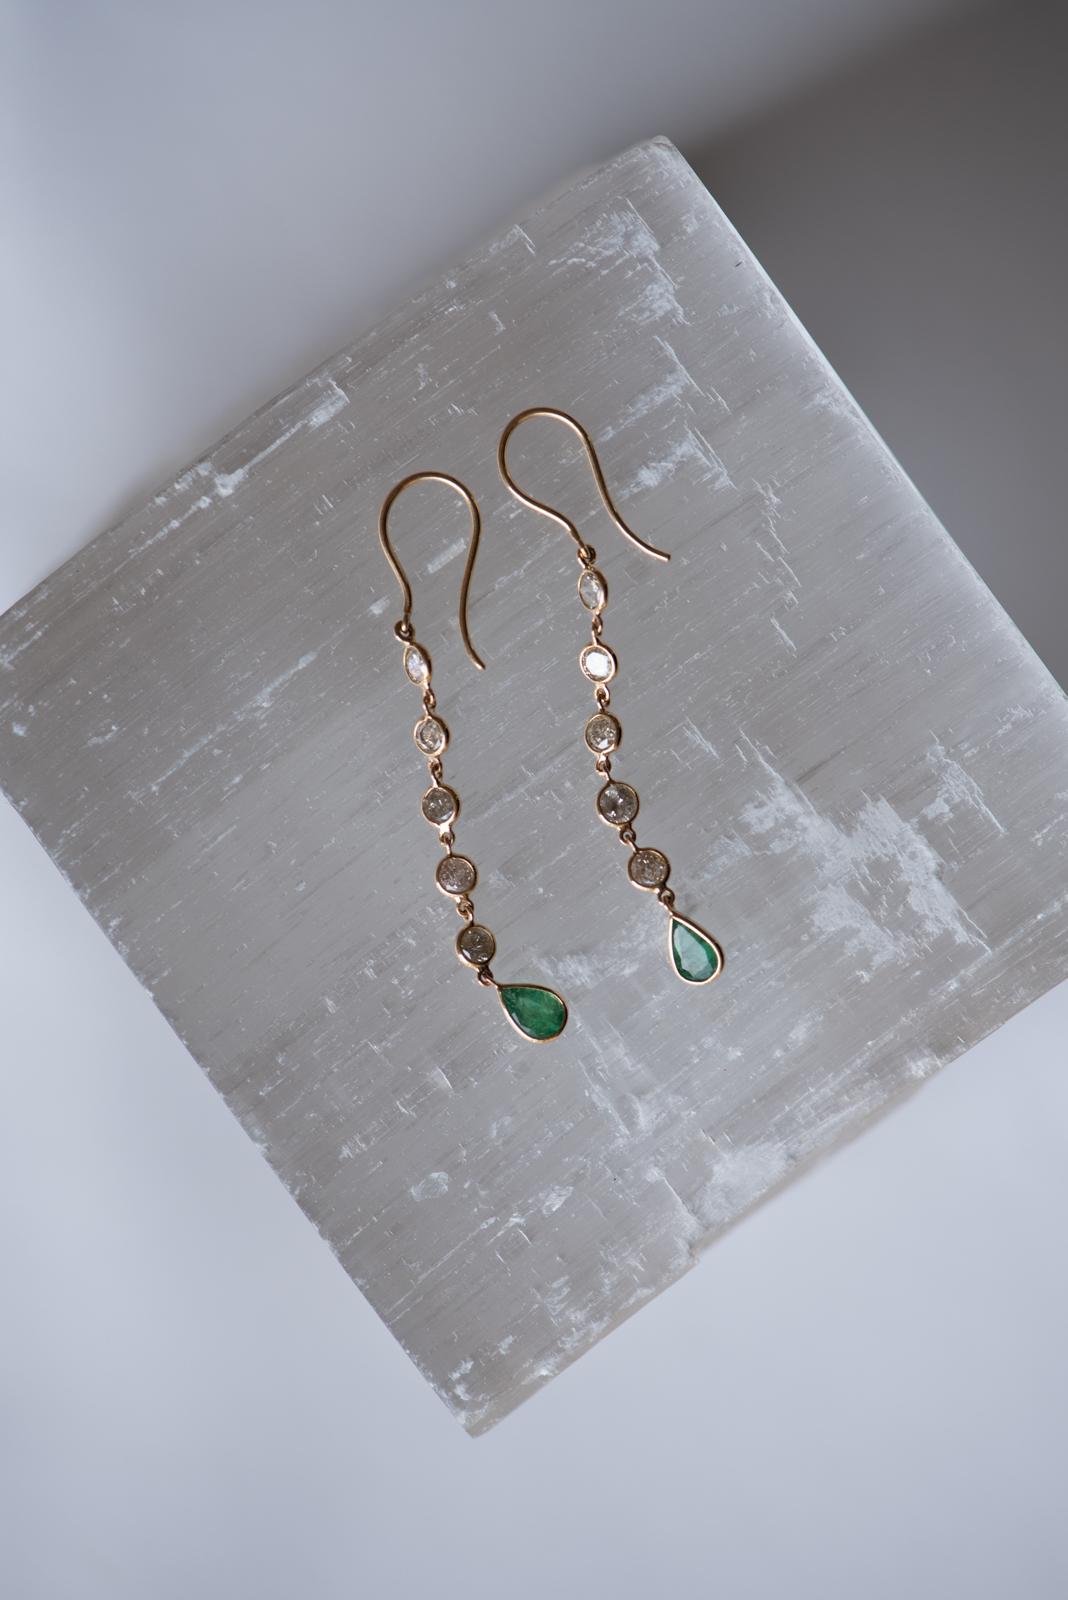 brilliance piercing jewelry-46.JPEG